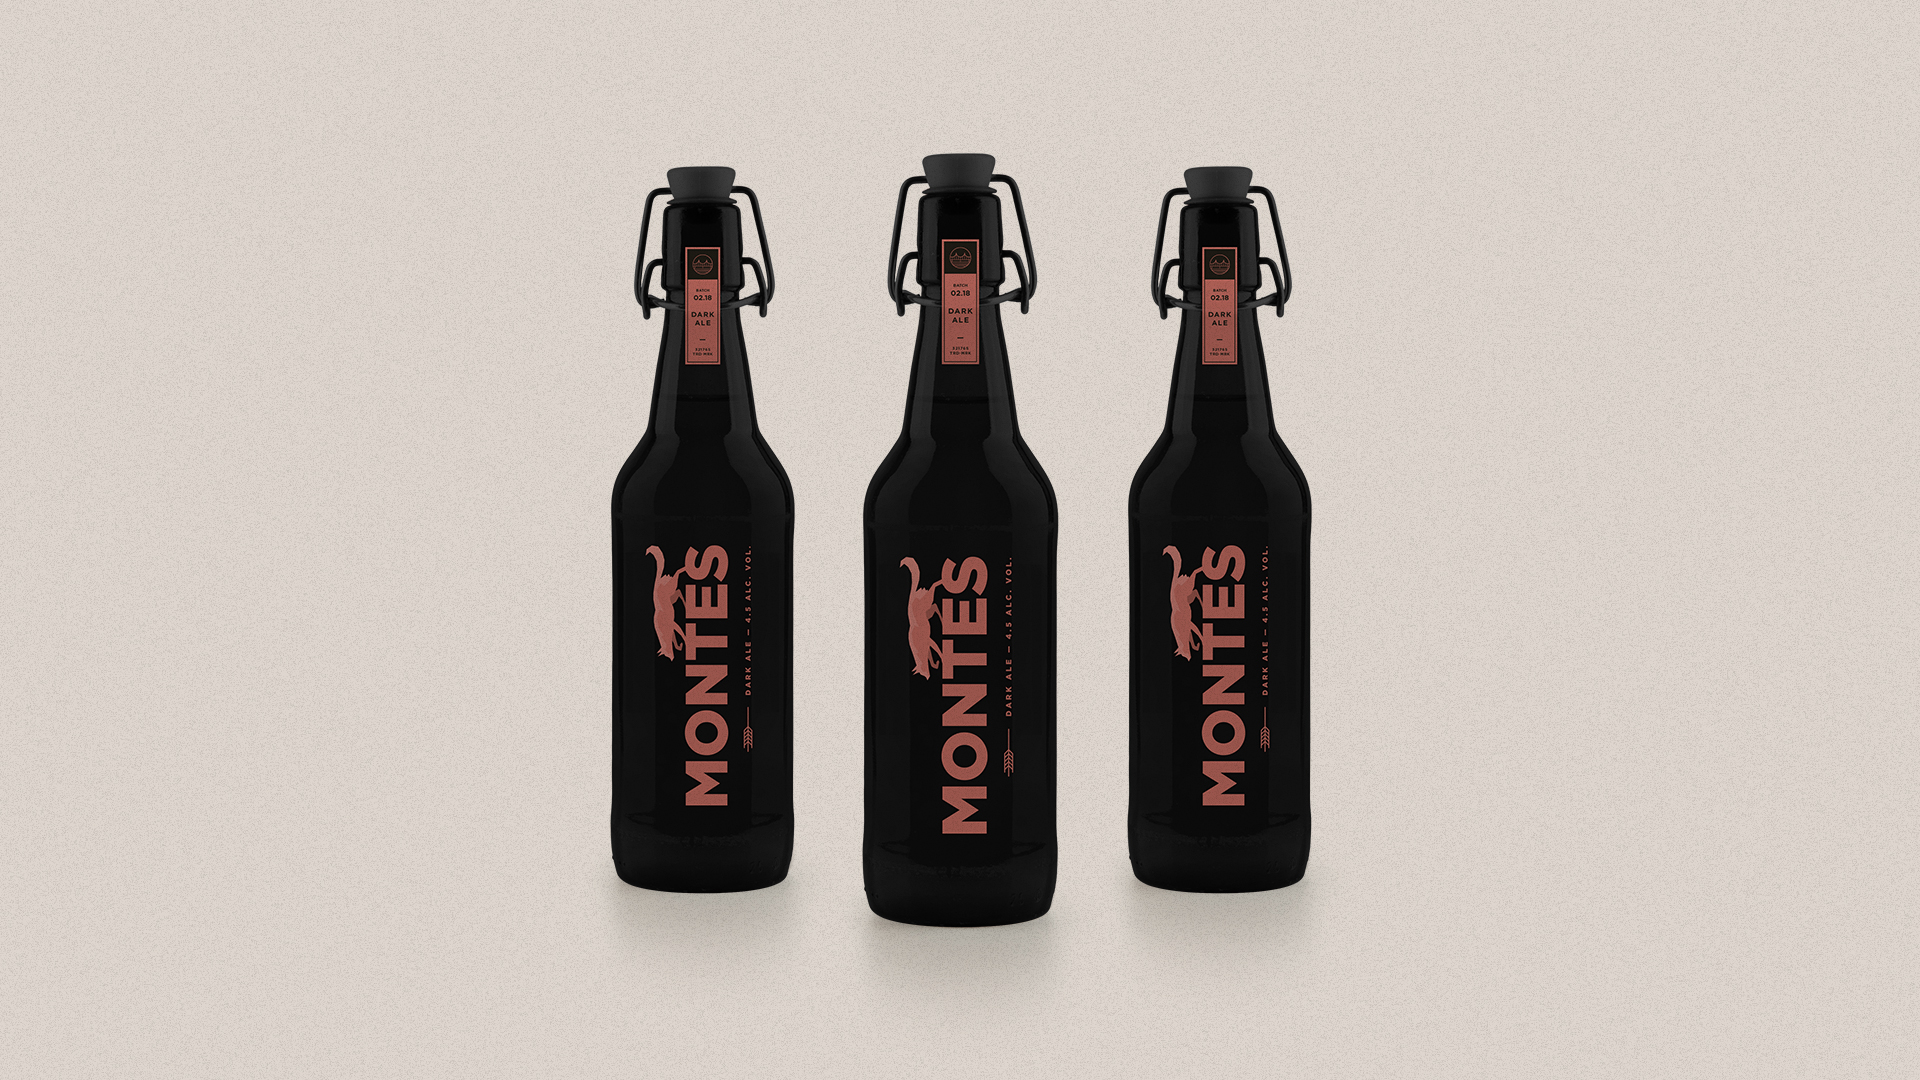 fmx_puenteviejo_botellas_montes